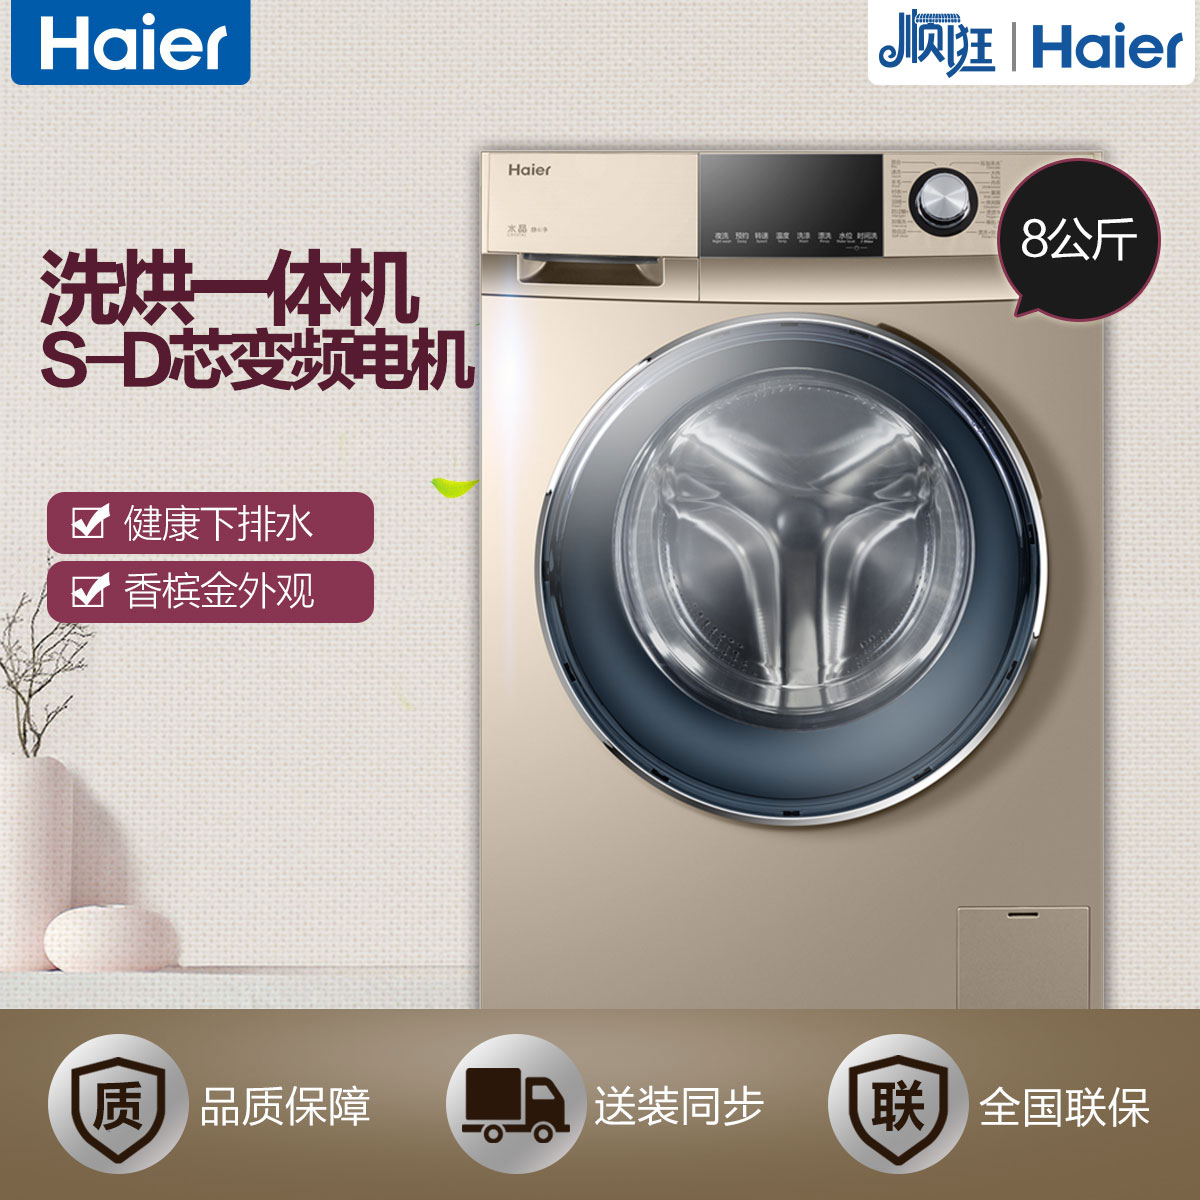 Haier/海尔滚筒洗衣机G80728HBX12G